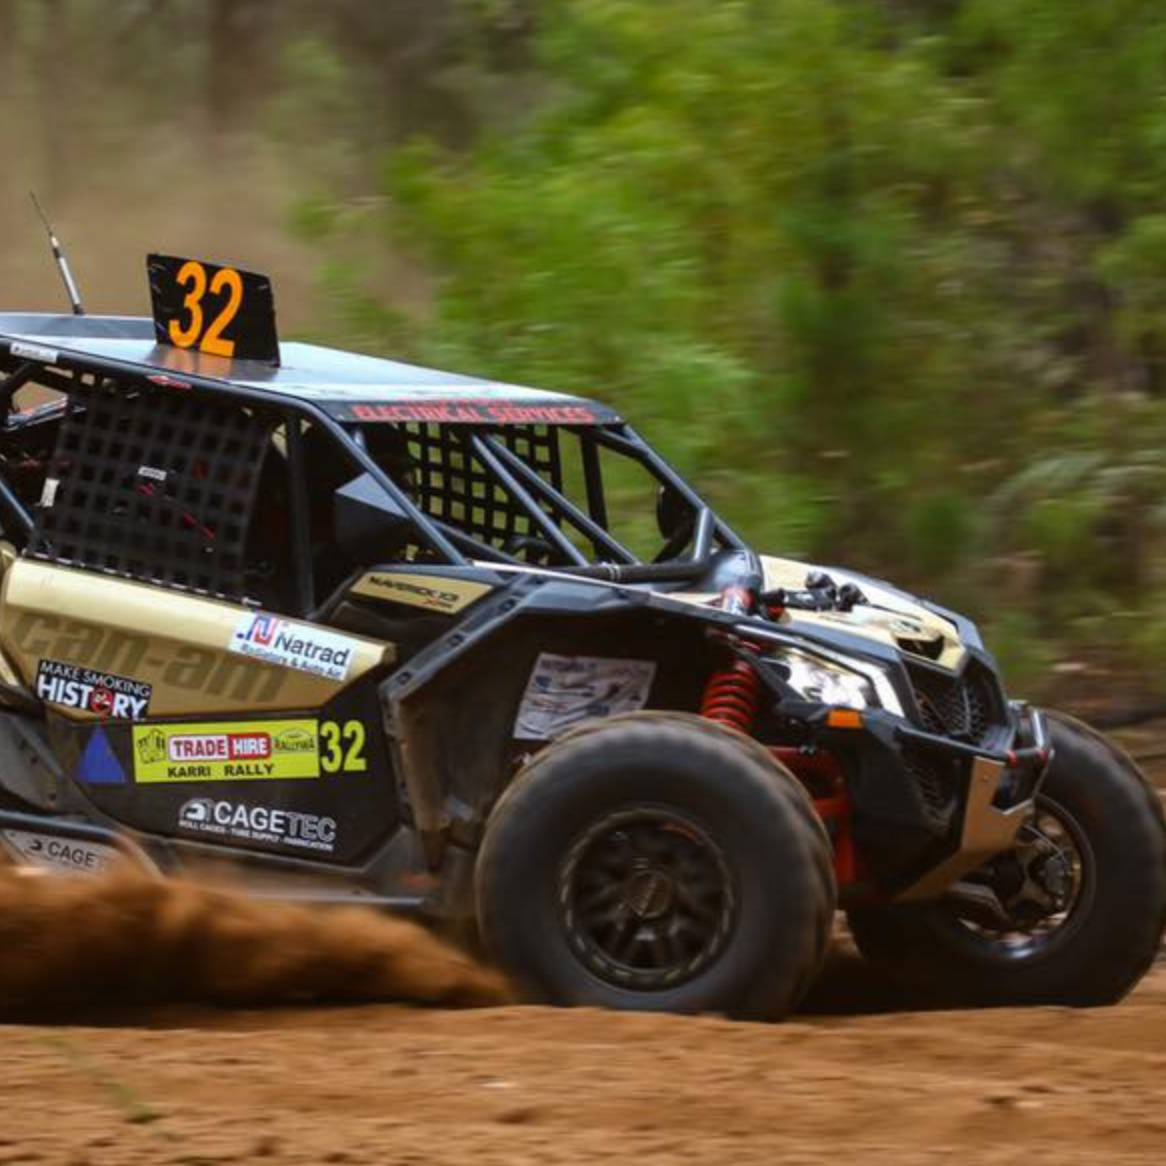 CHRIS UNSTEAD - Westvolt Offroad Racing, Western Australia